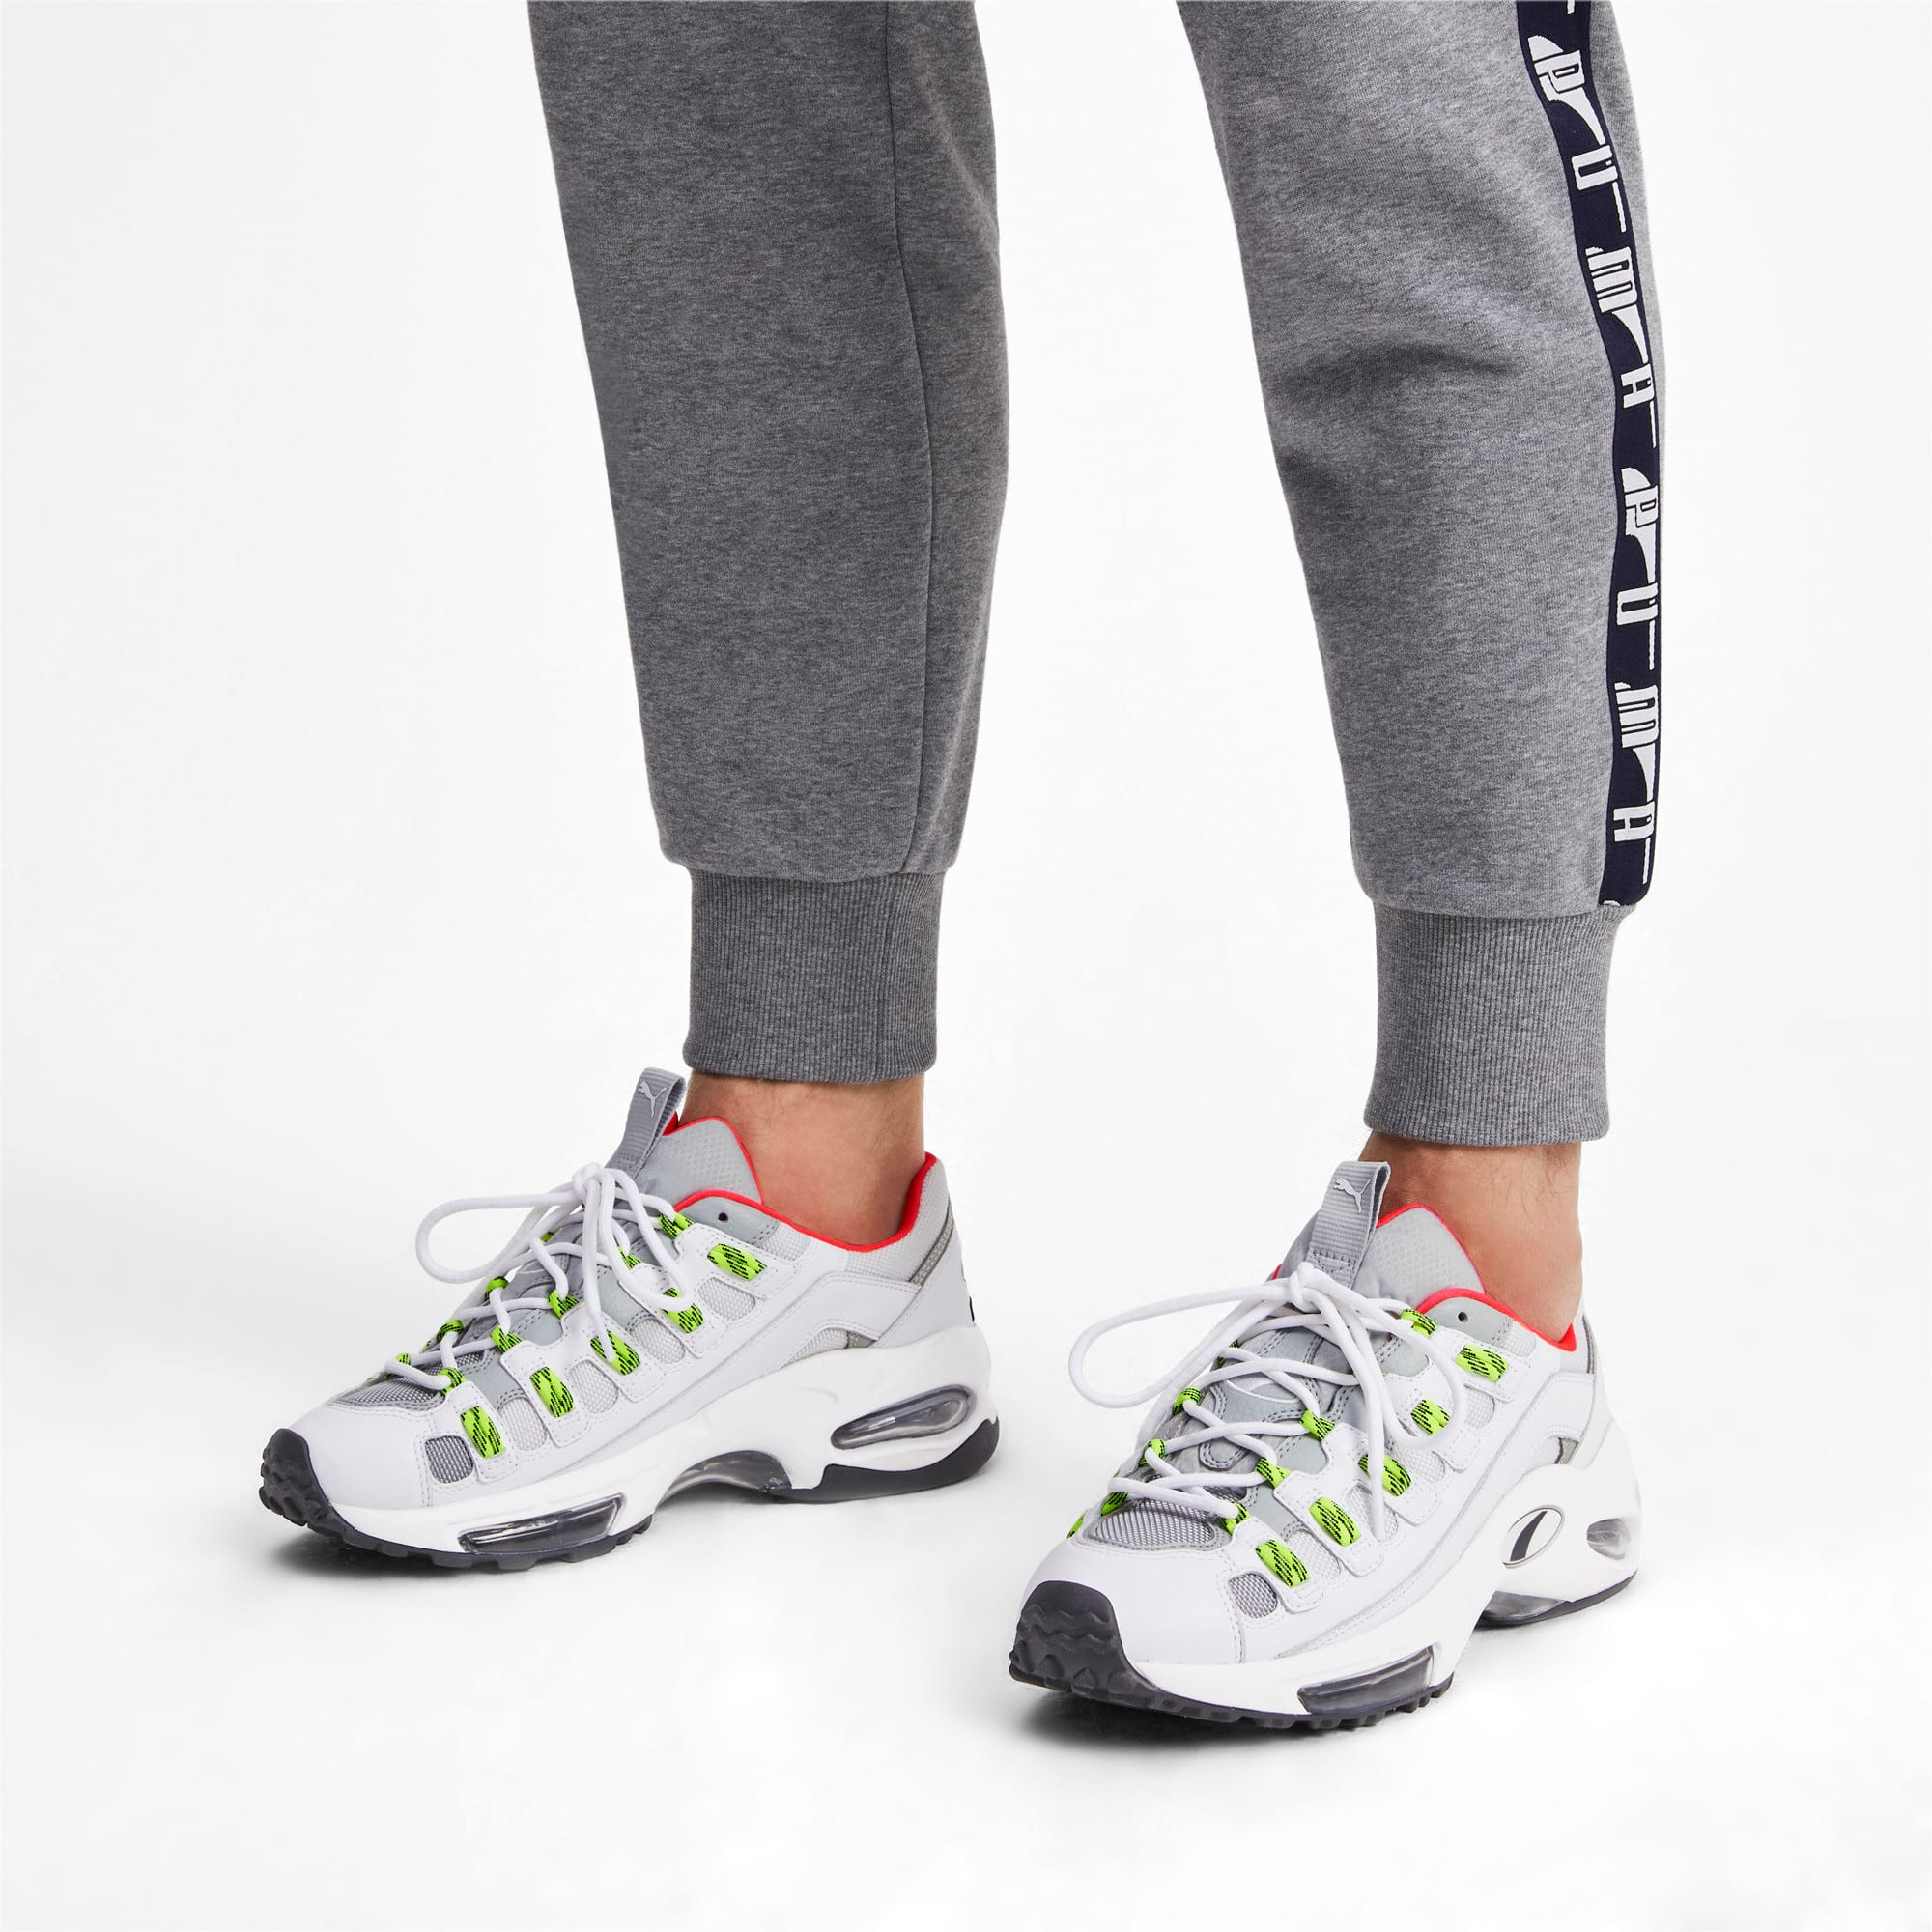 Thumbnail 2 of CELL Endura Rebound Sneakers, Puma White-High Rise, medium